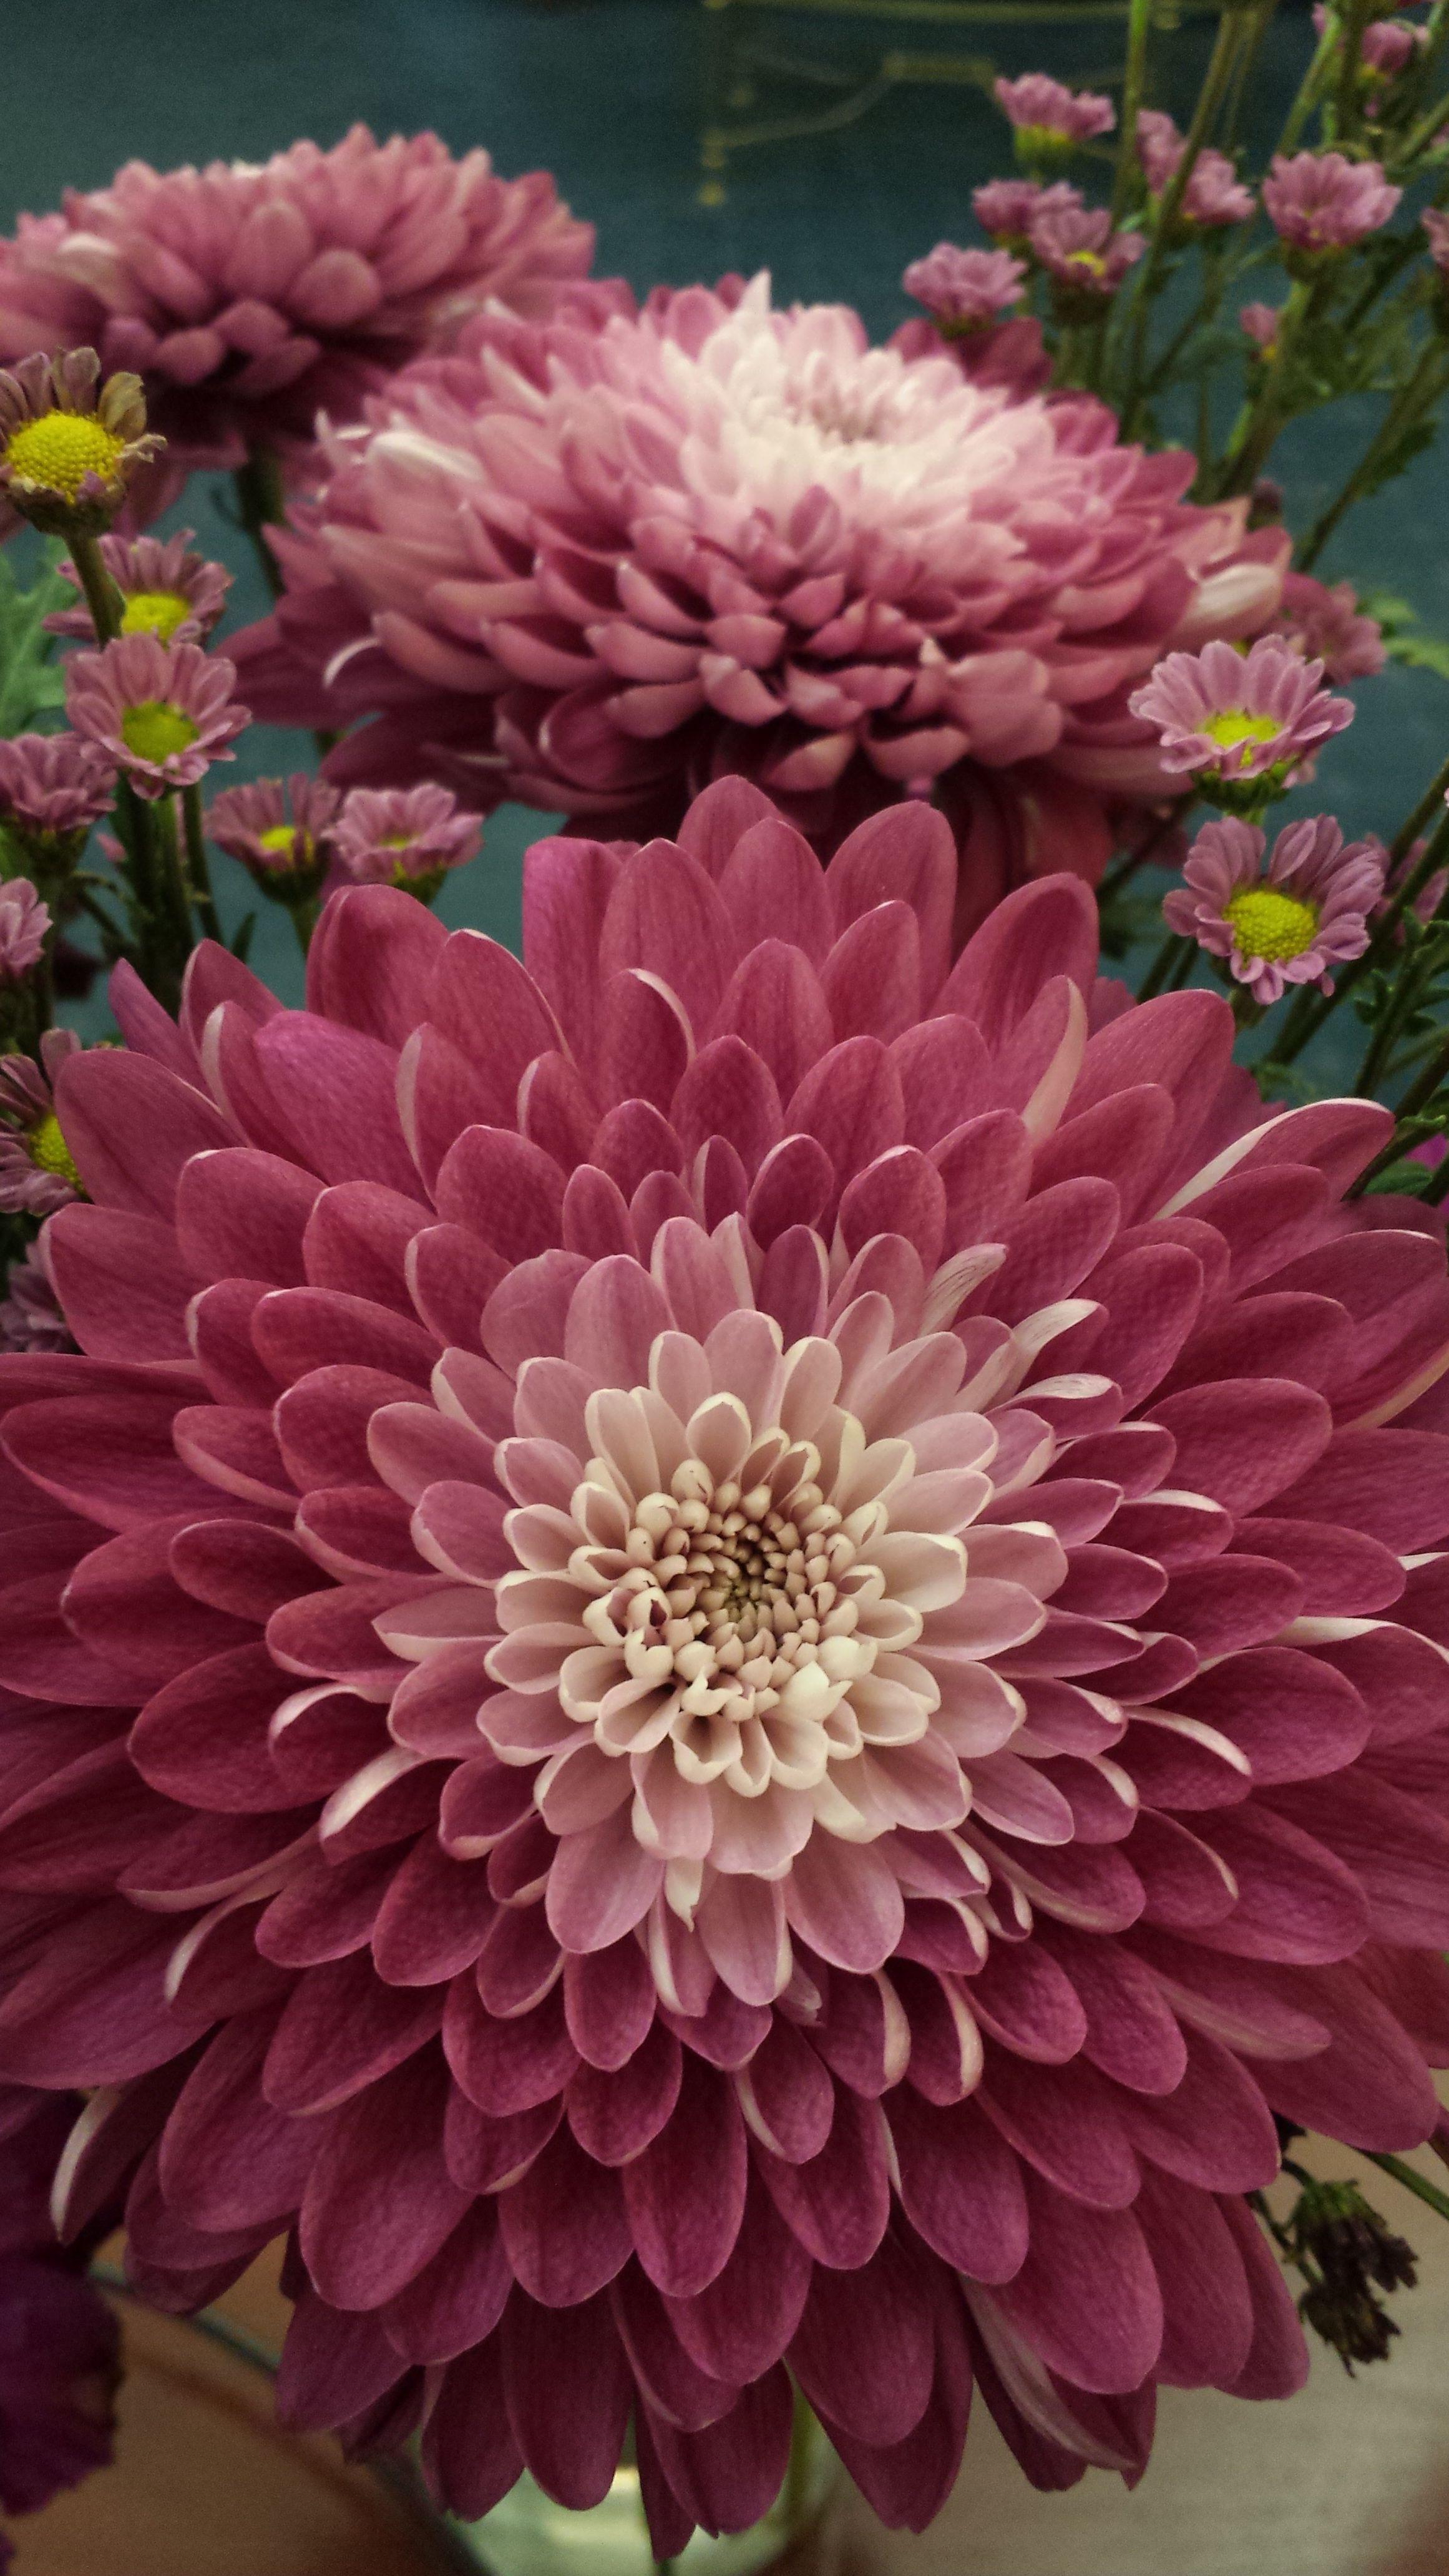 Dahlia Love this color